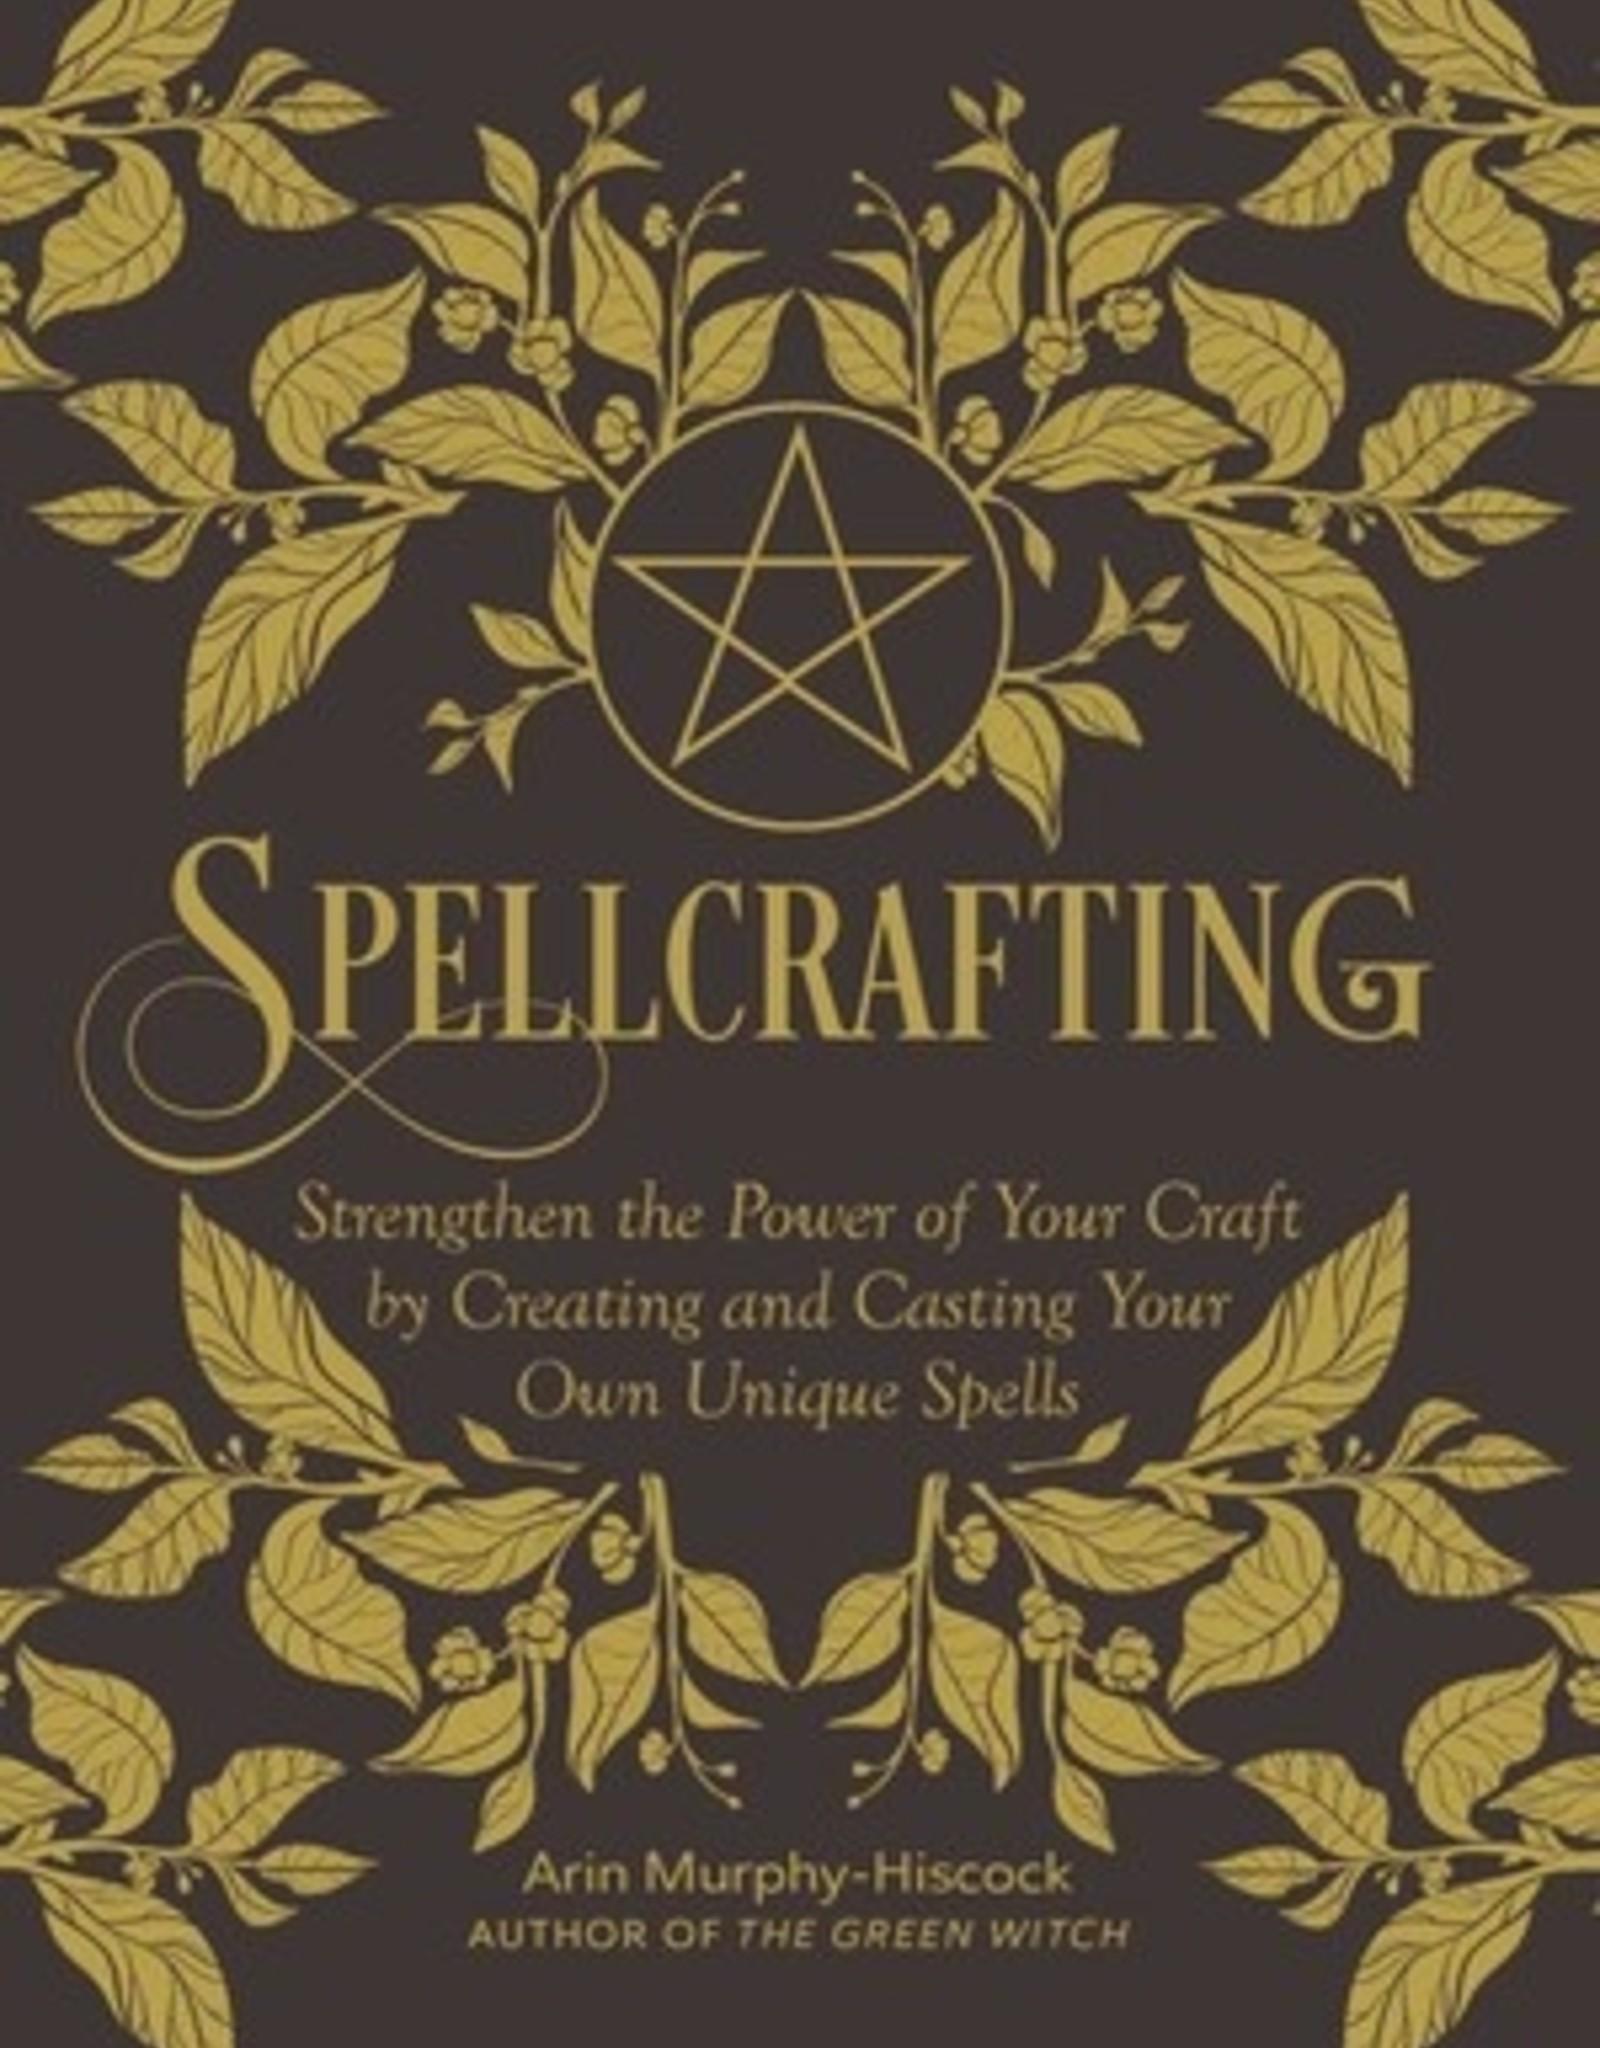 Simon & Schuster Spellcrafting